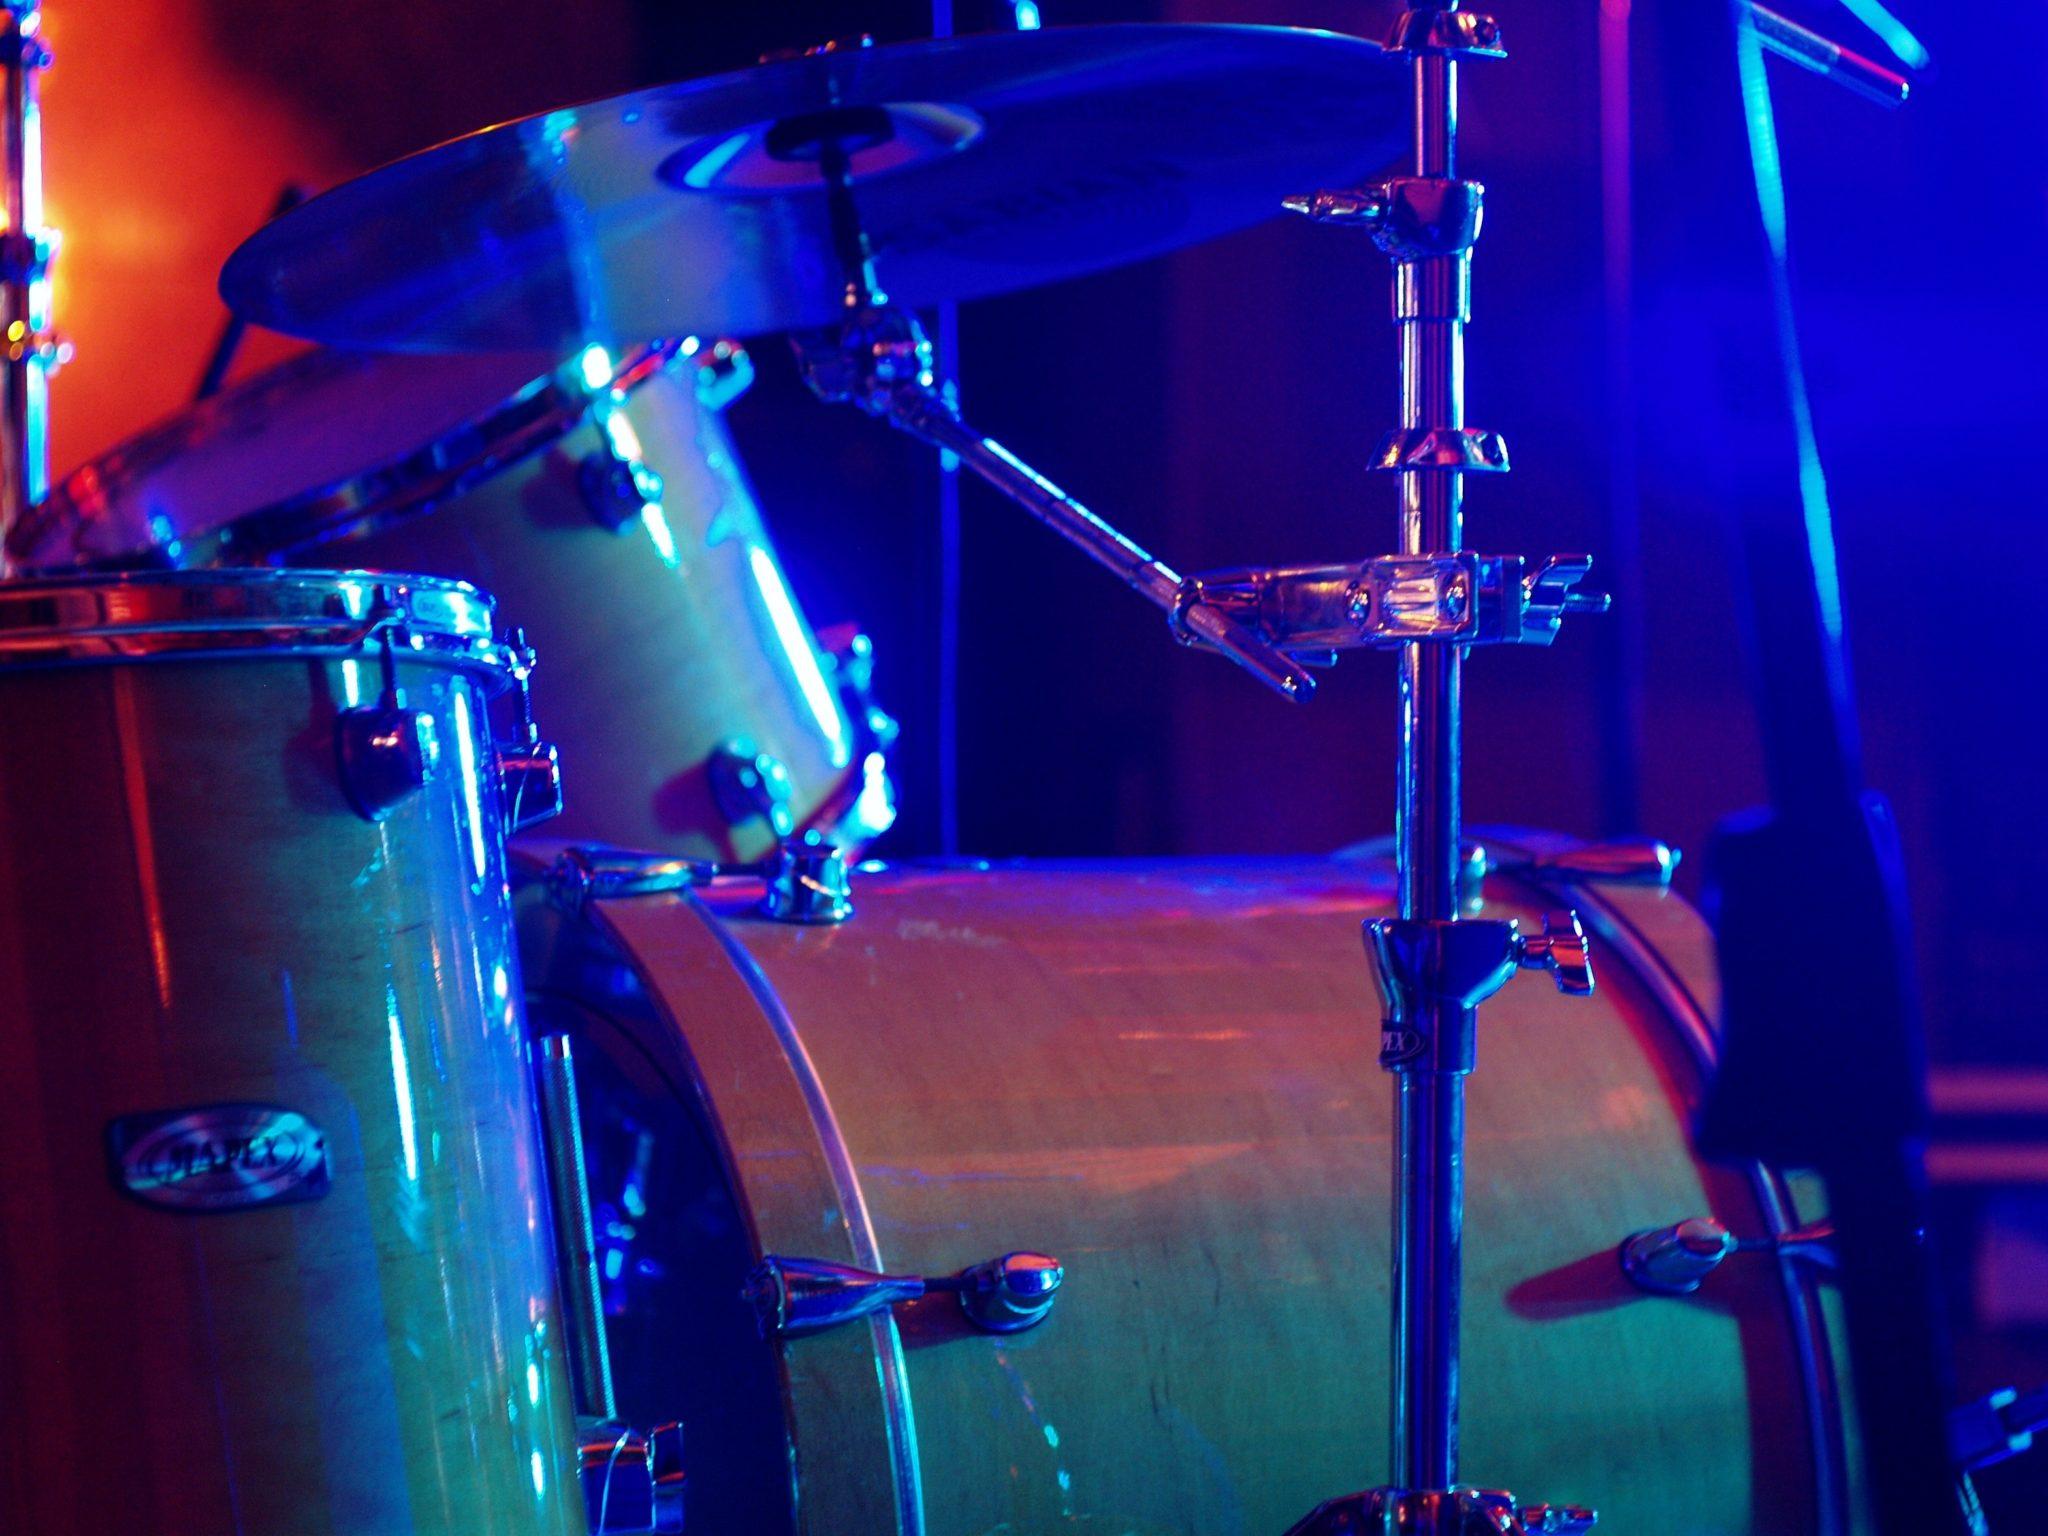 How to Tune Drums | GospelChops